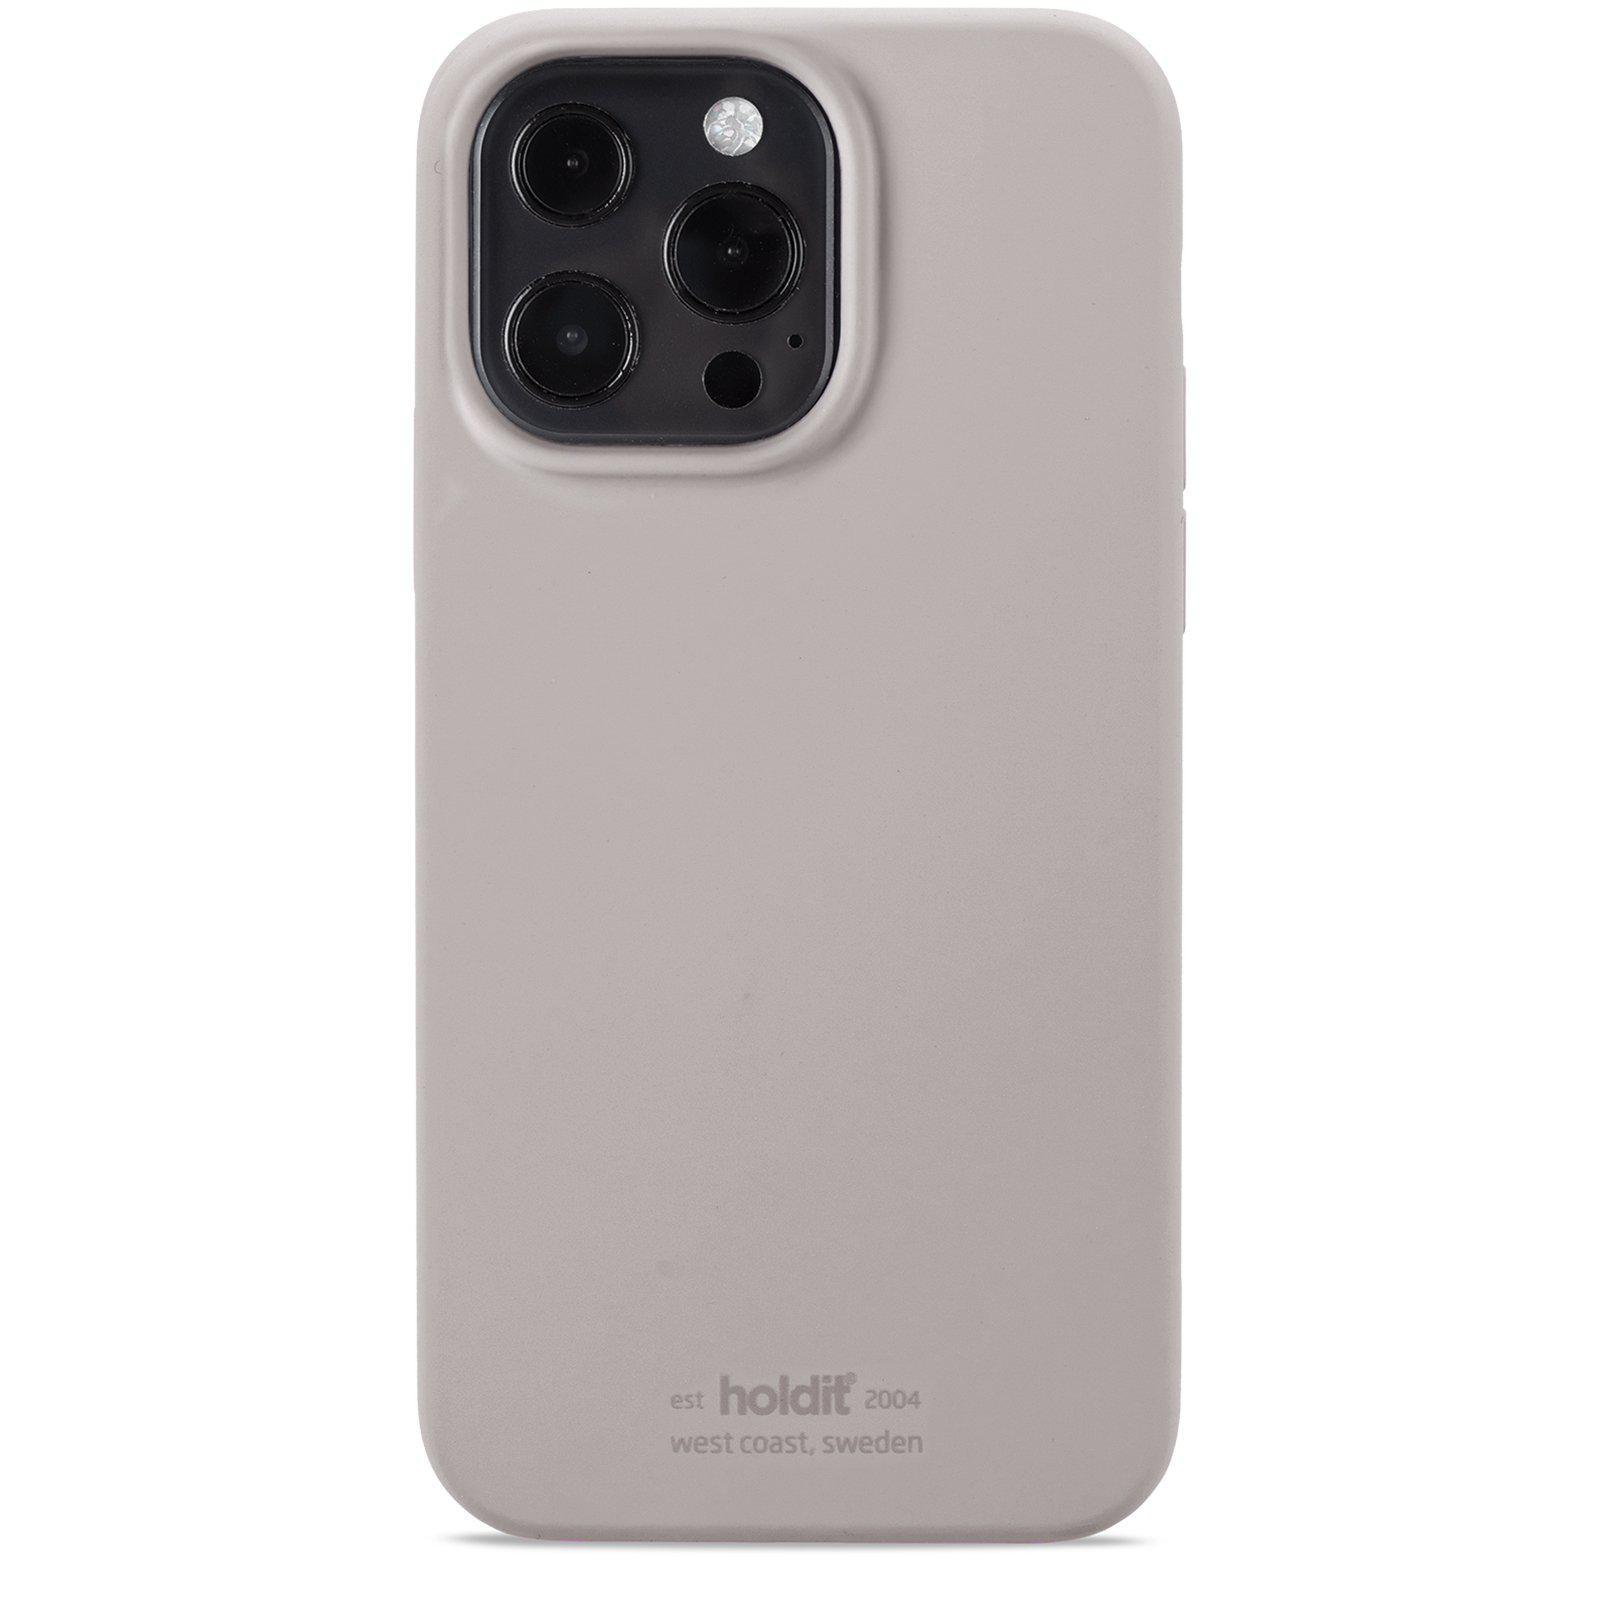 Silikonikuori iPhone 13 Pro Max Taupe